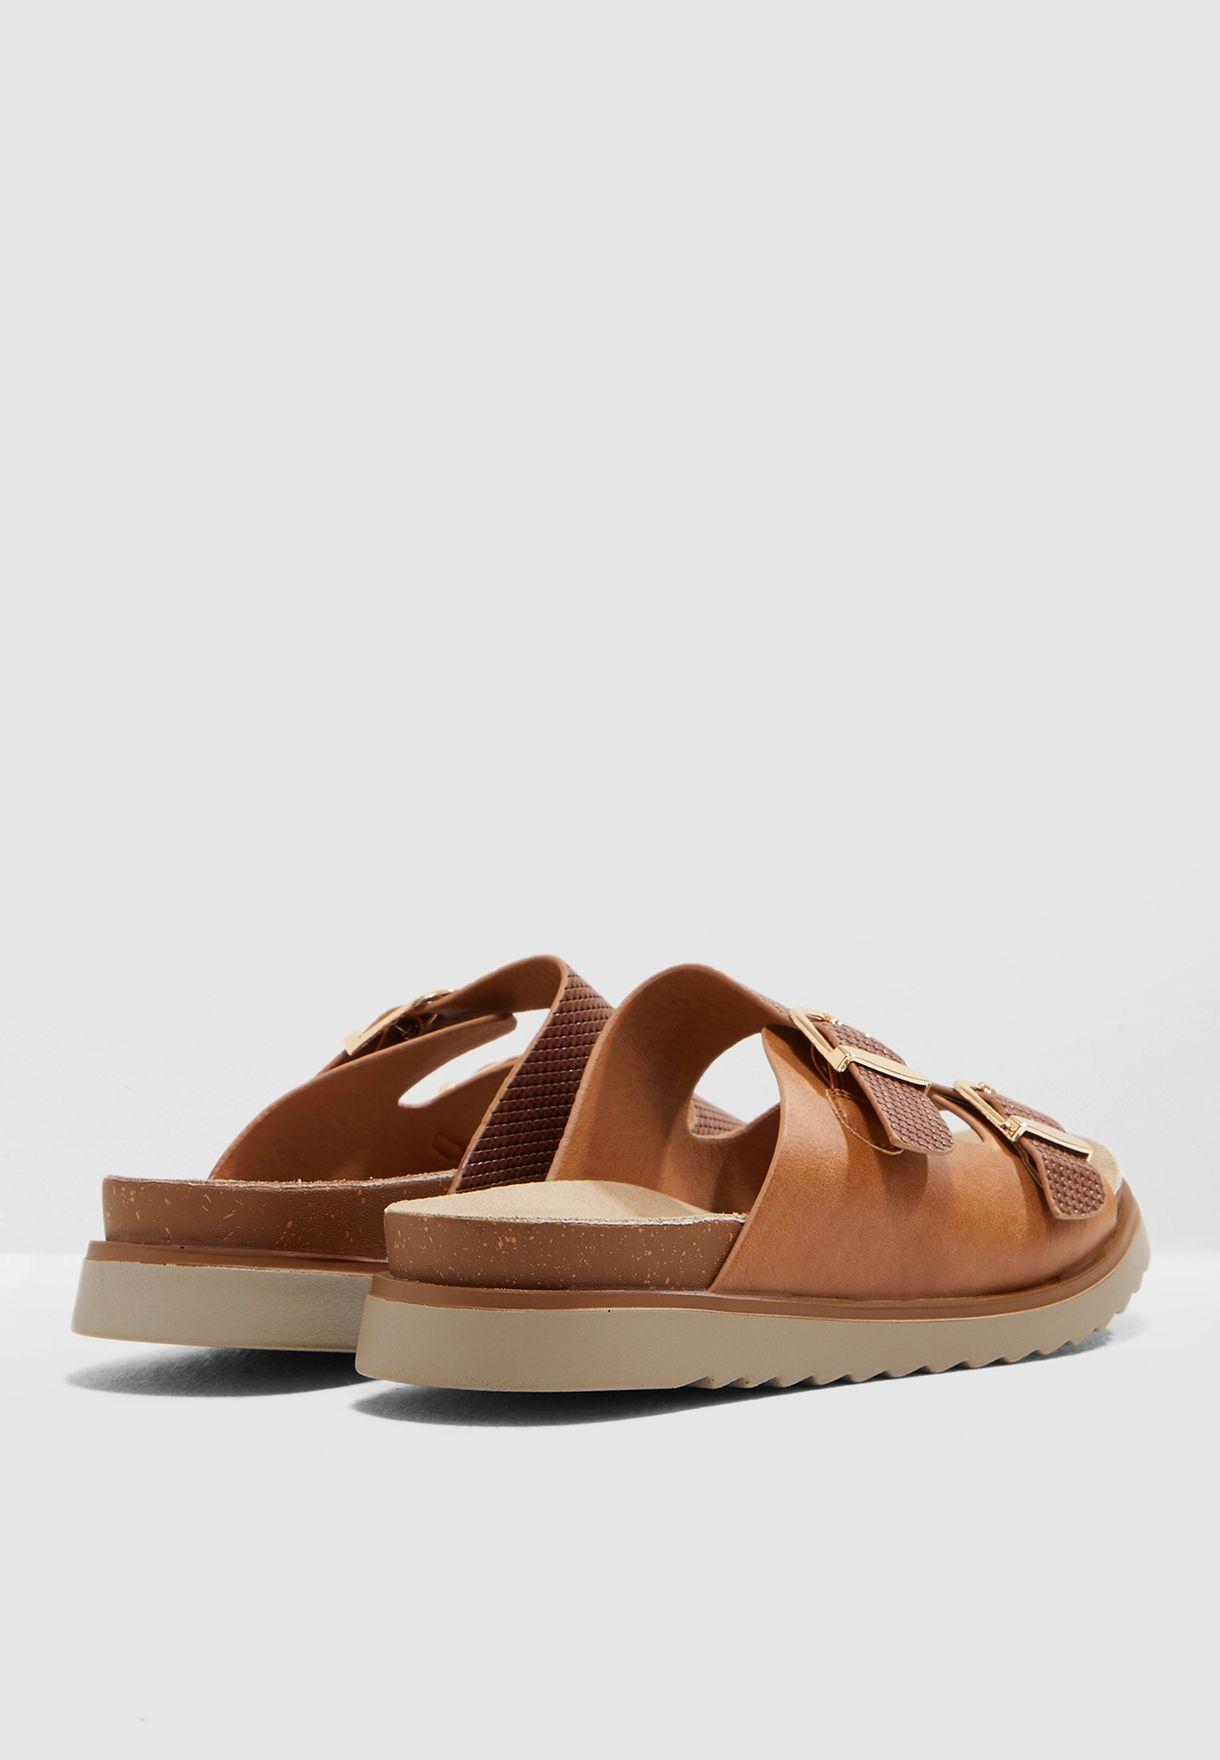 Double Buckle Stud Sandal